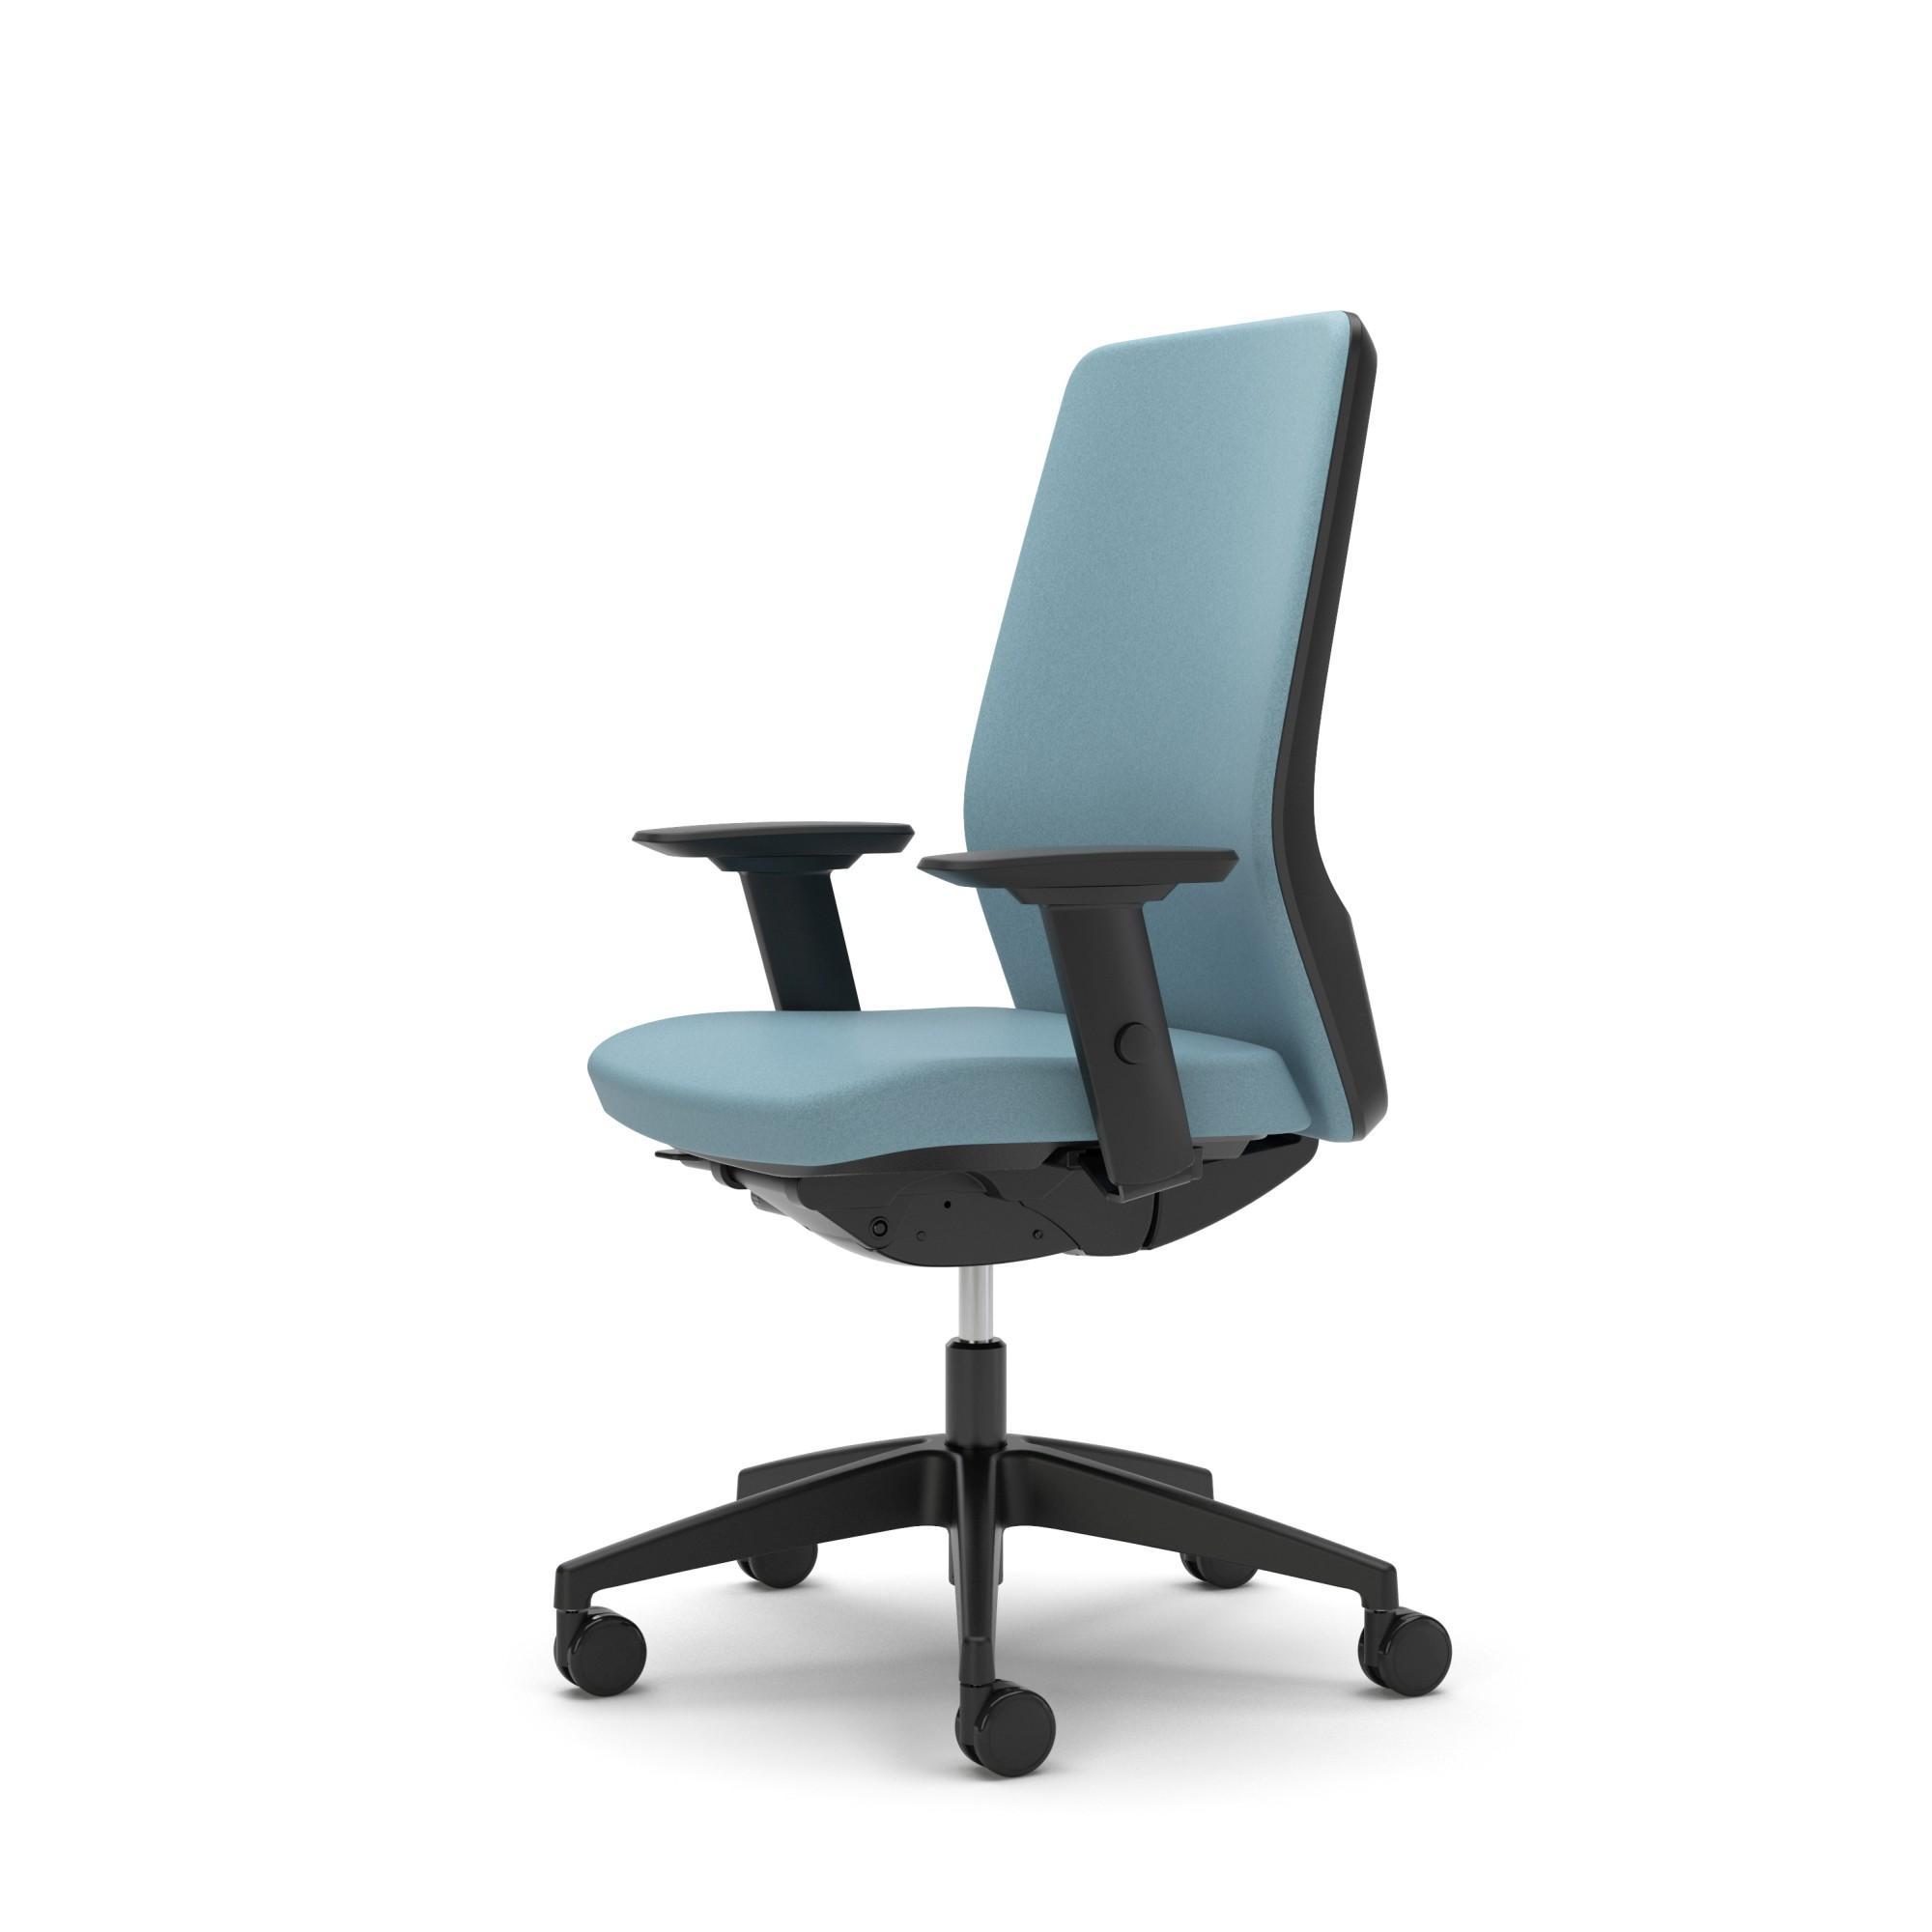 Interstuhl AIMis1 1S01 - Drehstuhl | Online-Shop für Büromöbel ...